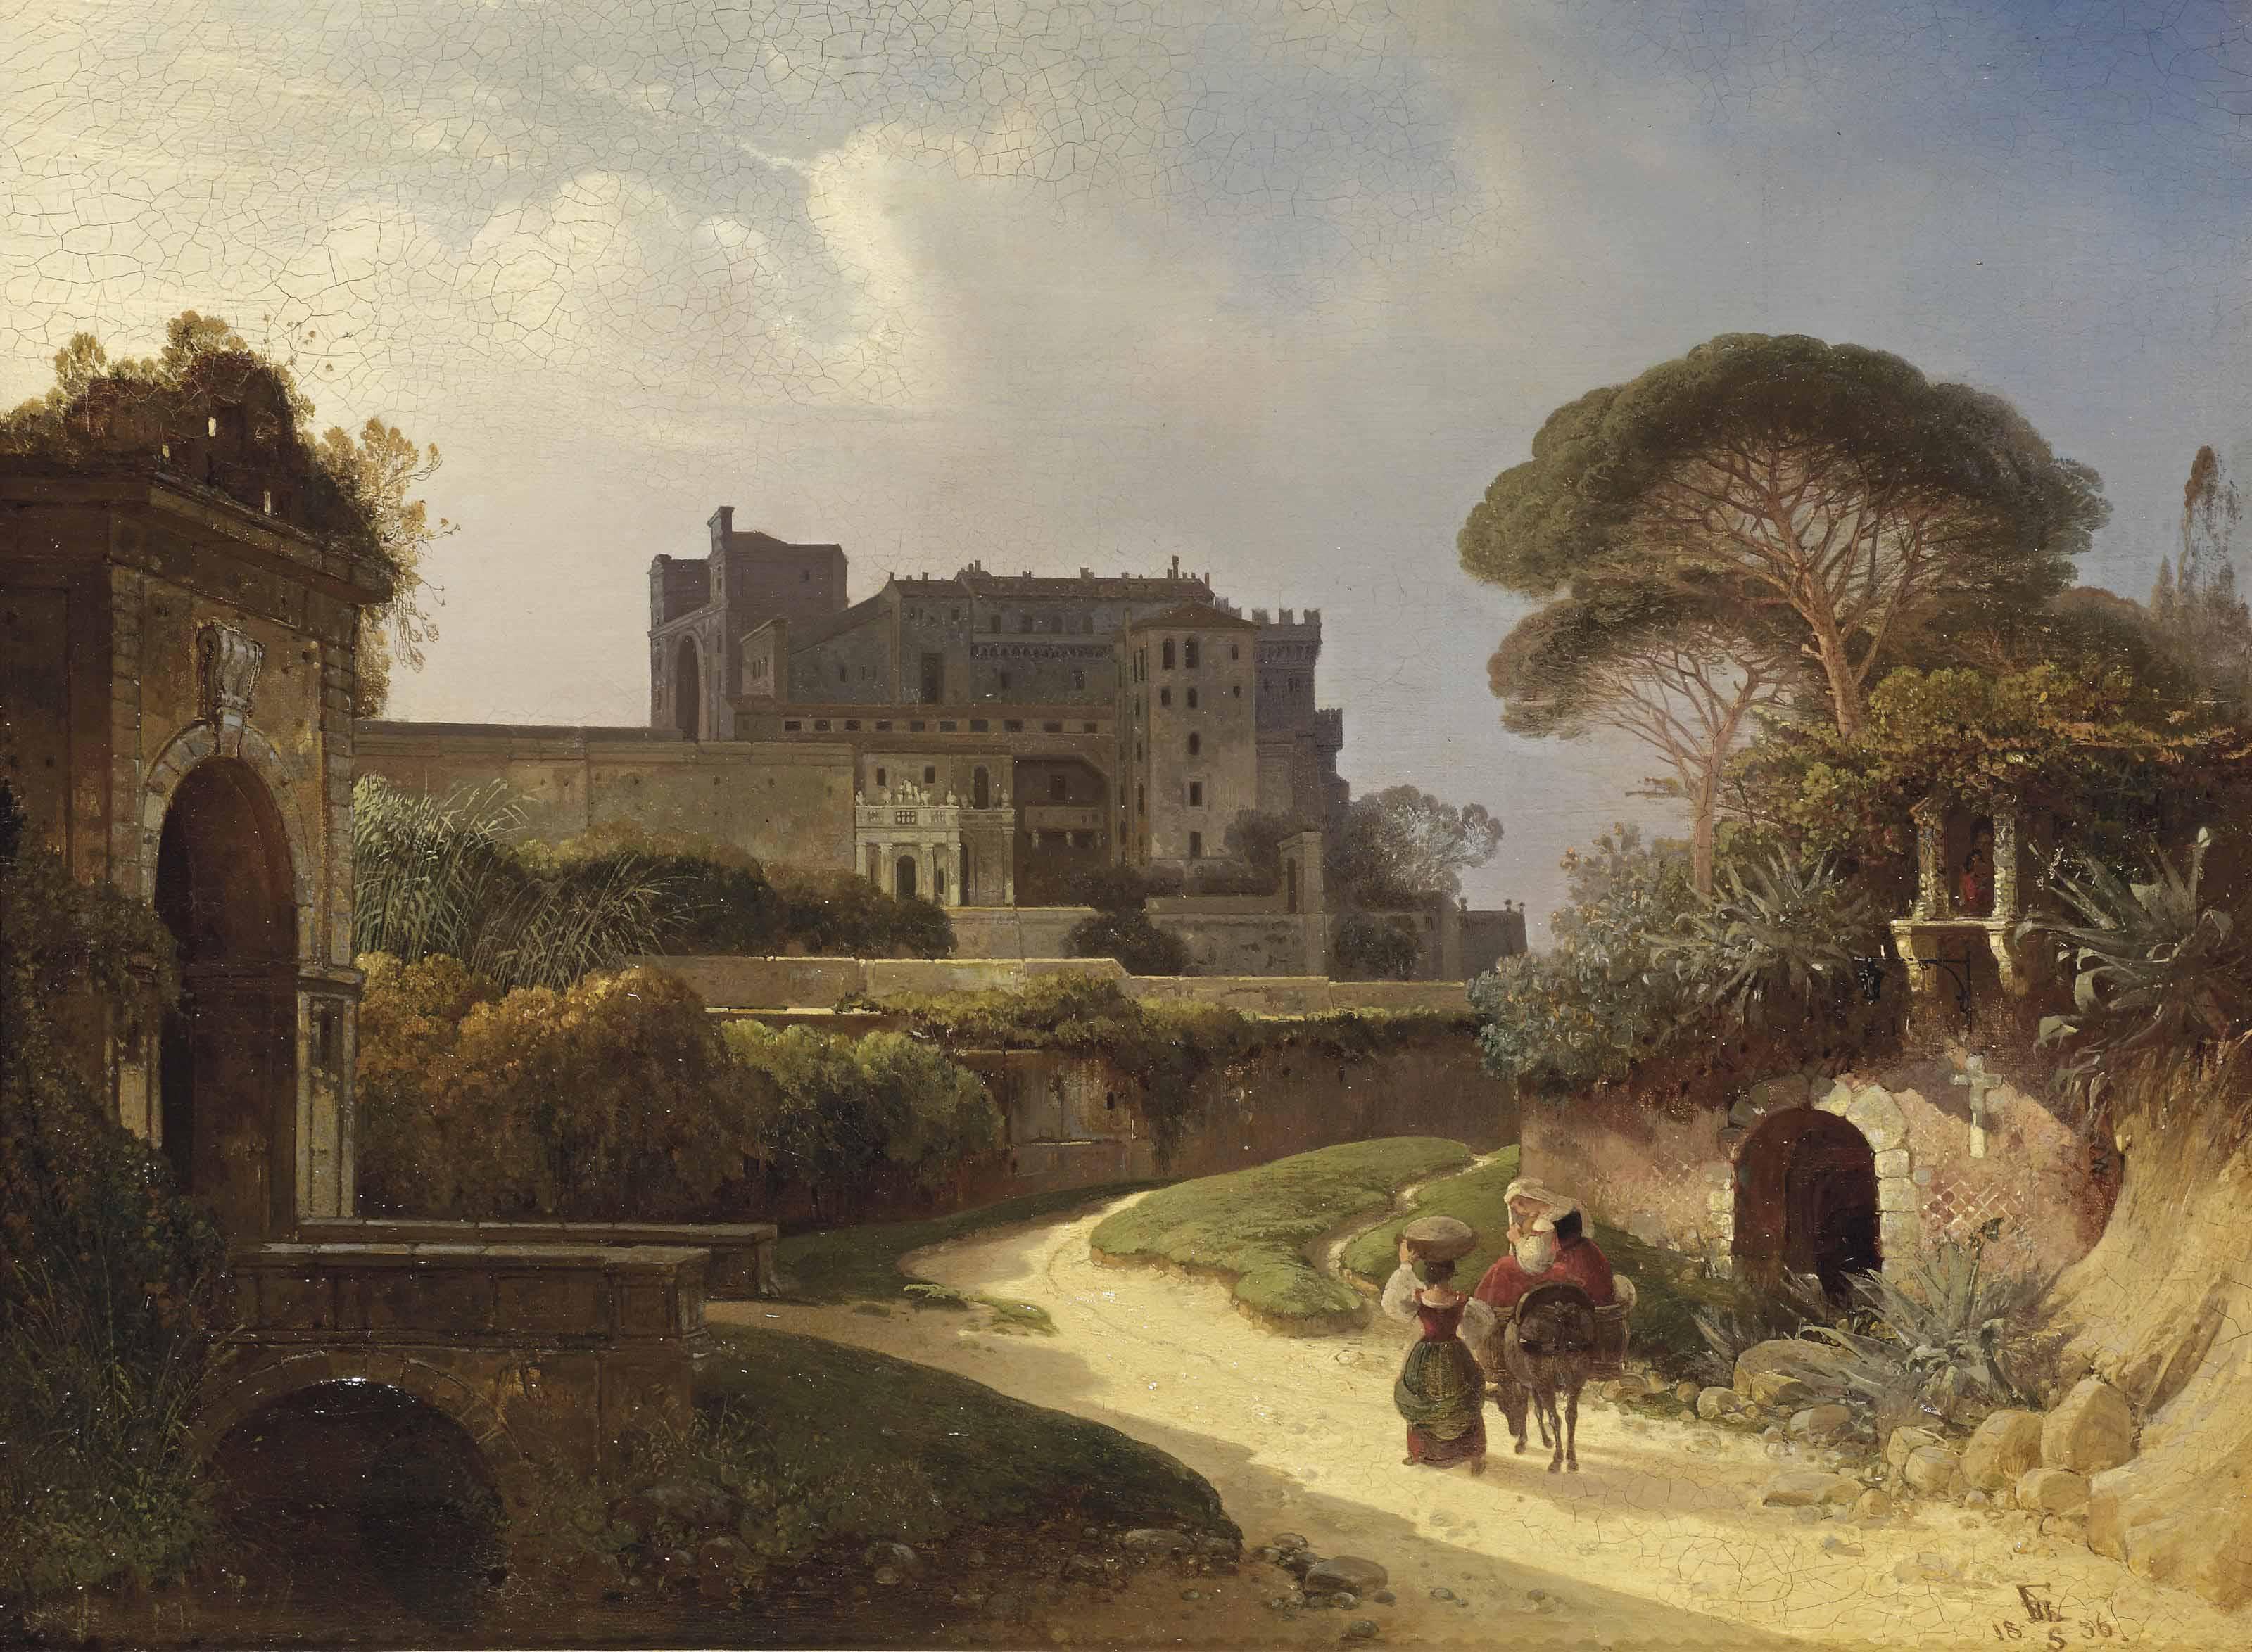 A veduta of an Italian castello and gardens